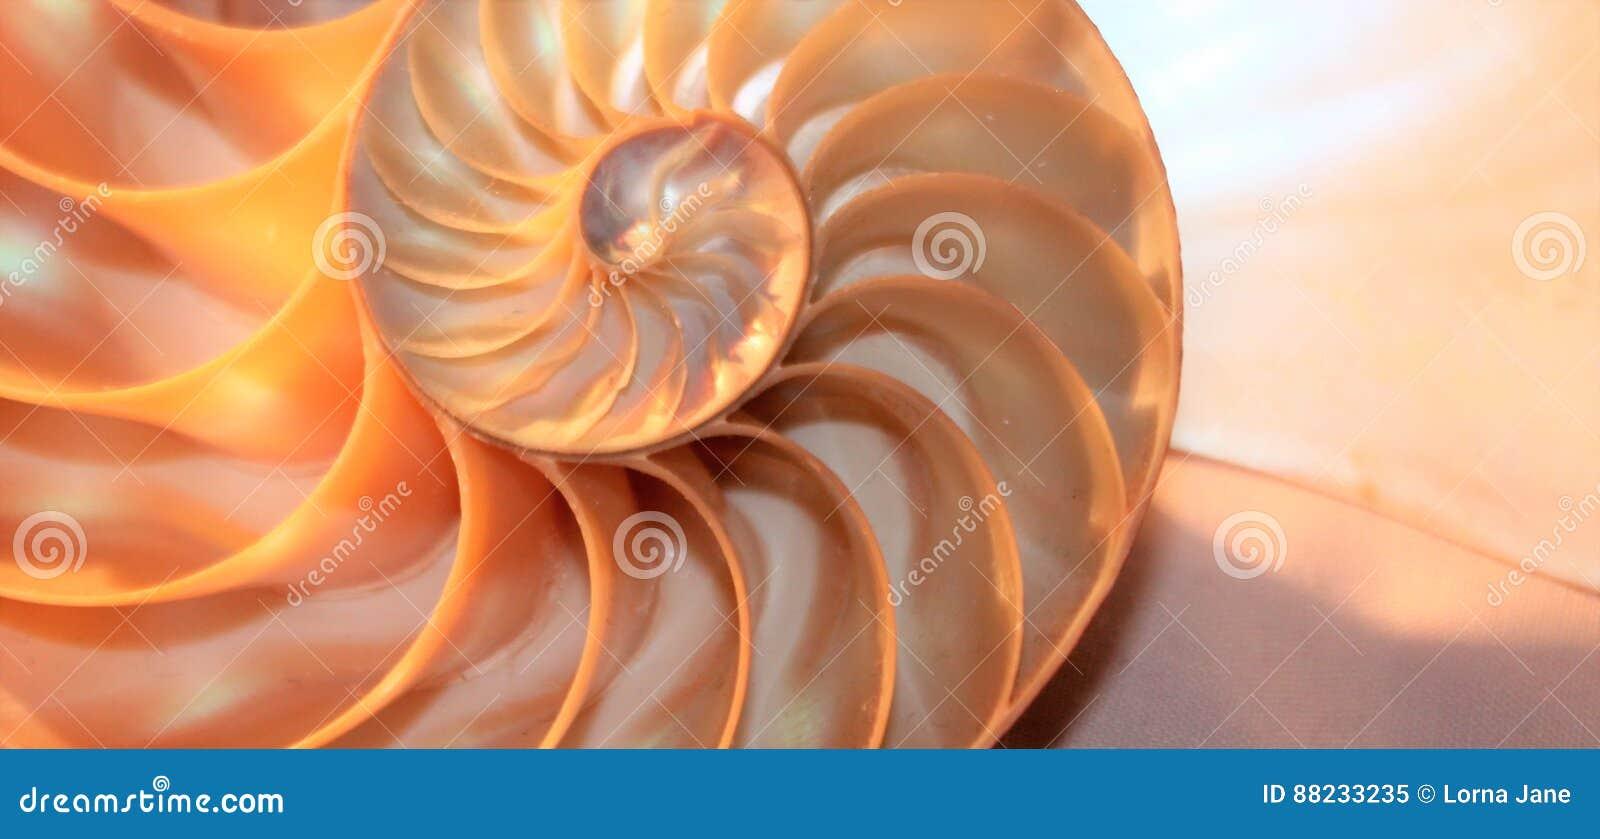 Nautilusmuschel-Fibonacci-Symmetriequerschnittspiralenstruktur-Wachstumsgoldener schnitt